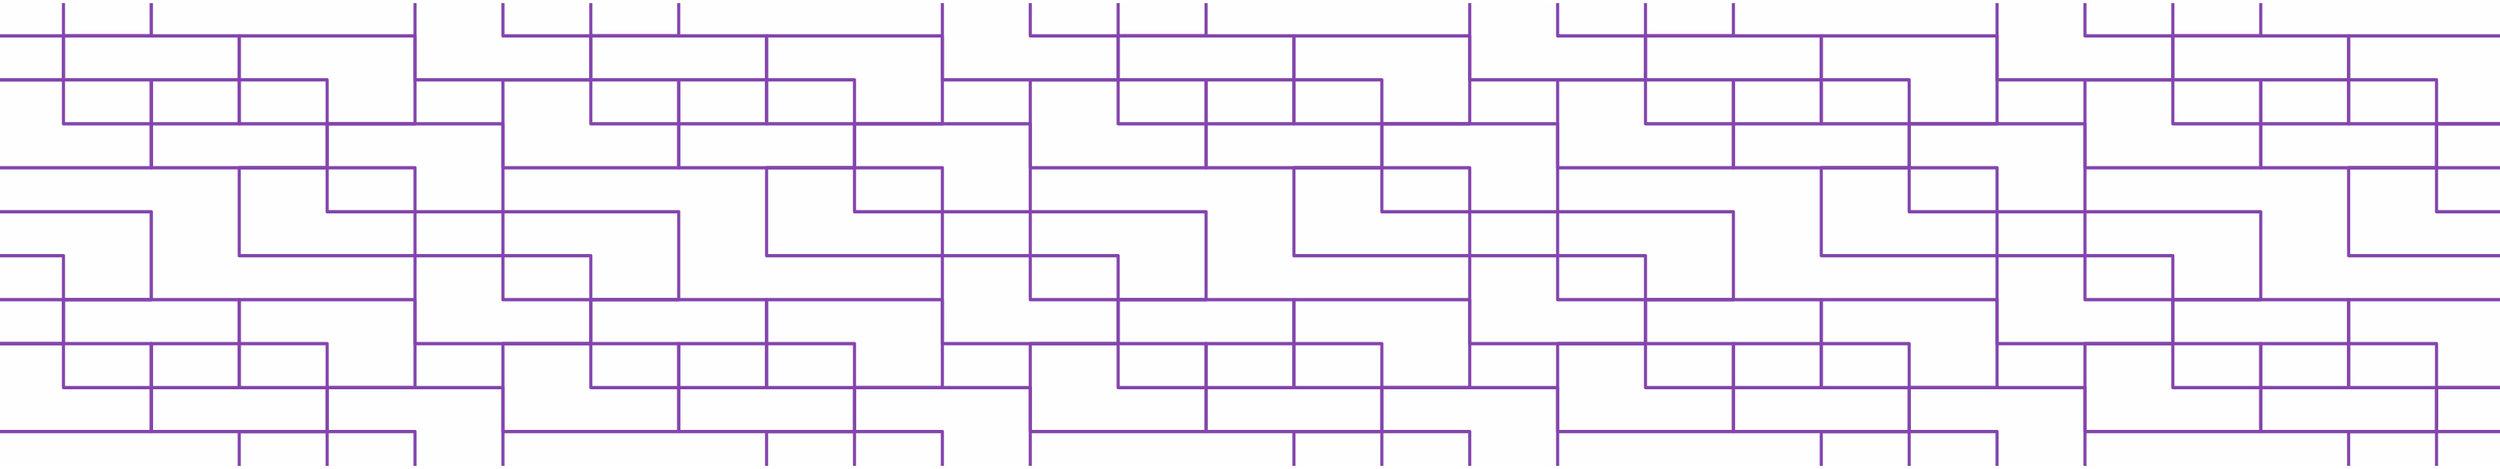 coa-pattern_05@2x.jpg